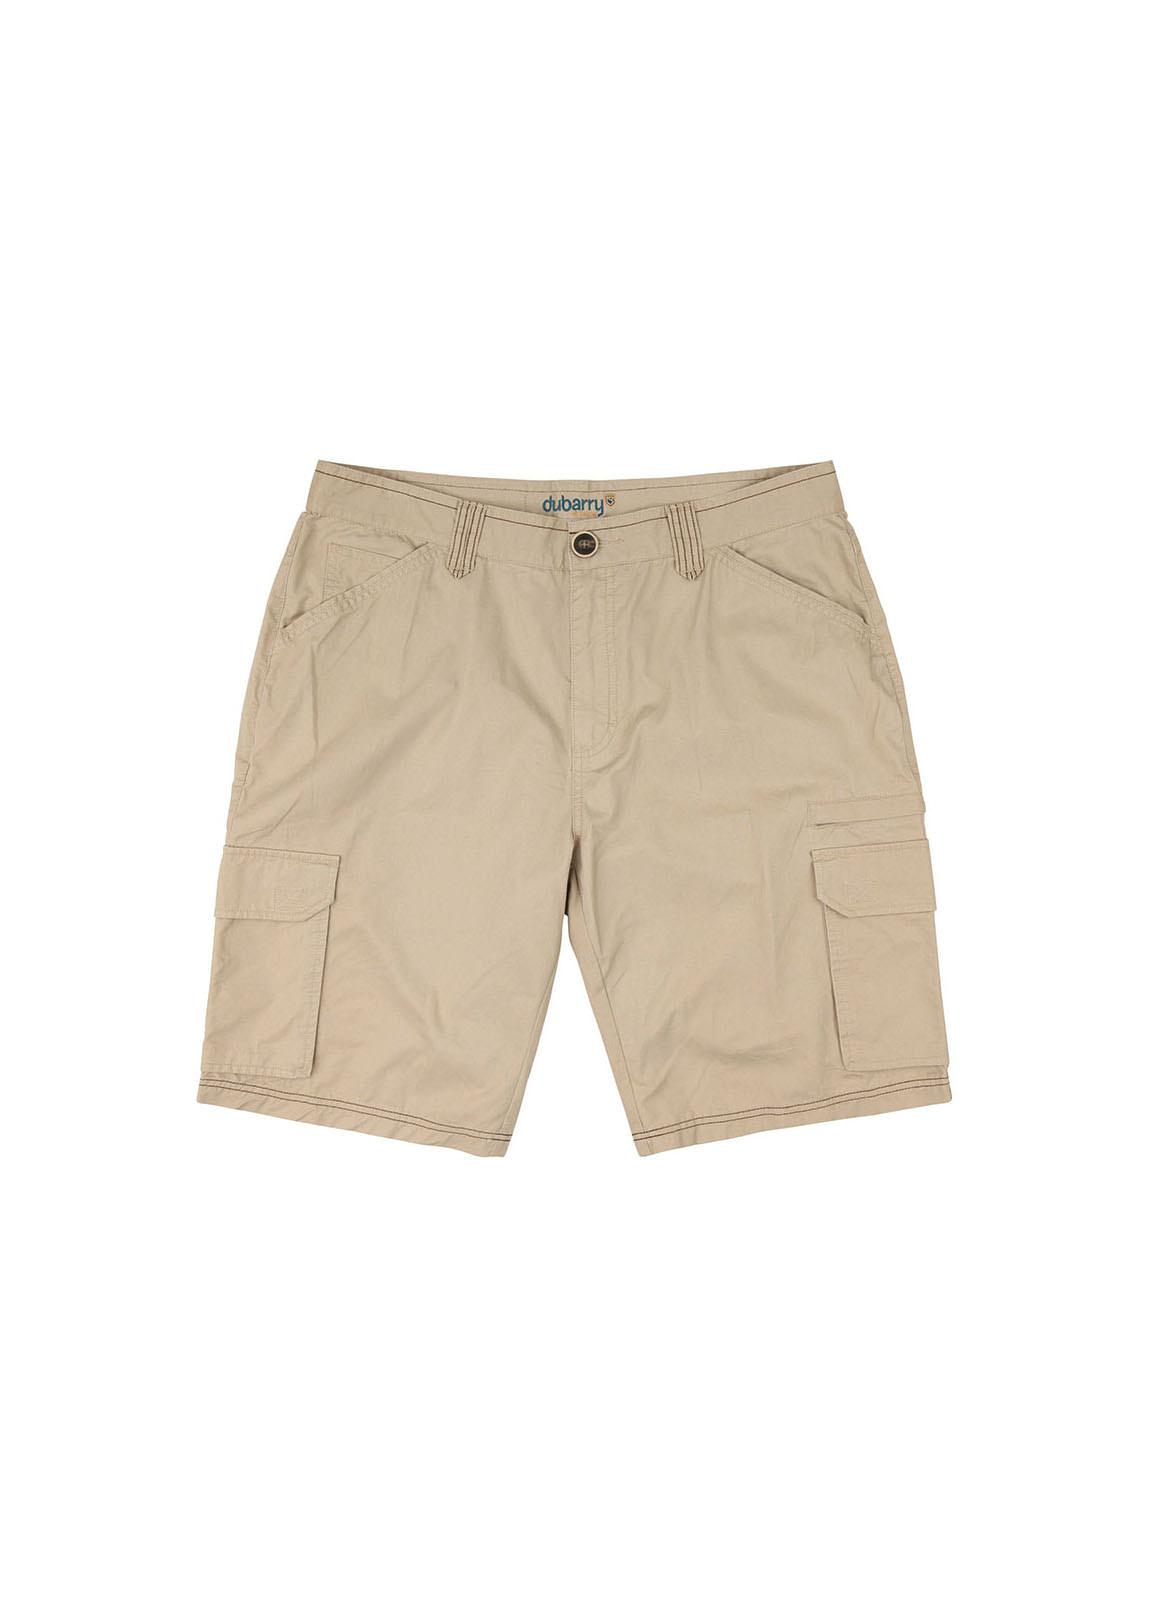 Allen Mens Shorts - Stone